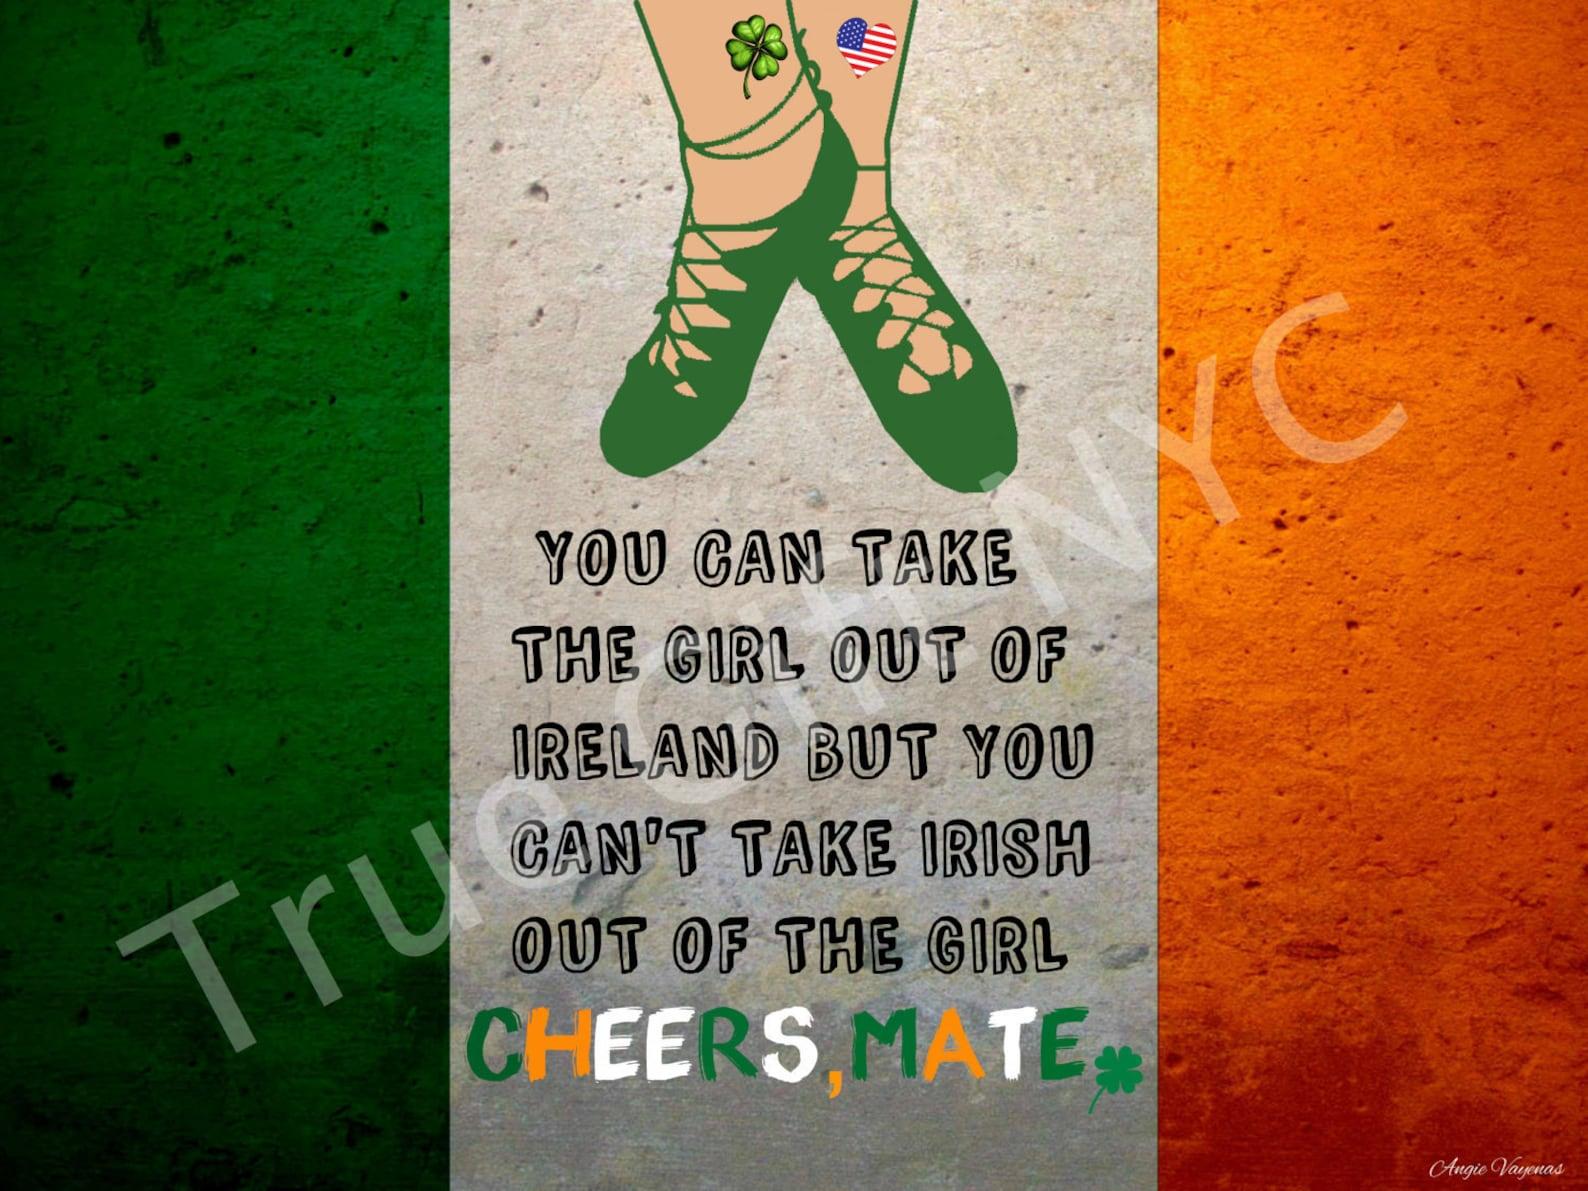 irish, saint patrick's day, cheers mate, ireland, lucky clover, shamrock, irish girl, dancing shoes, ballet shoes, st. patri